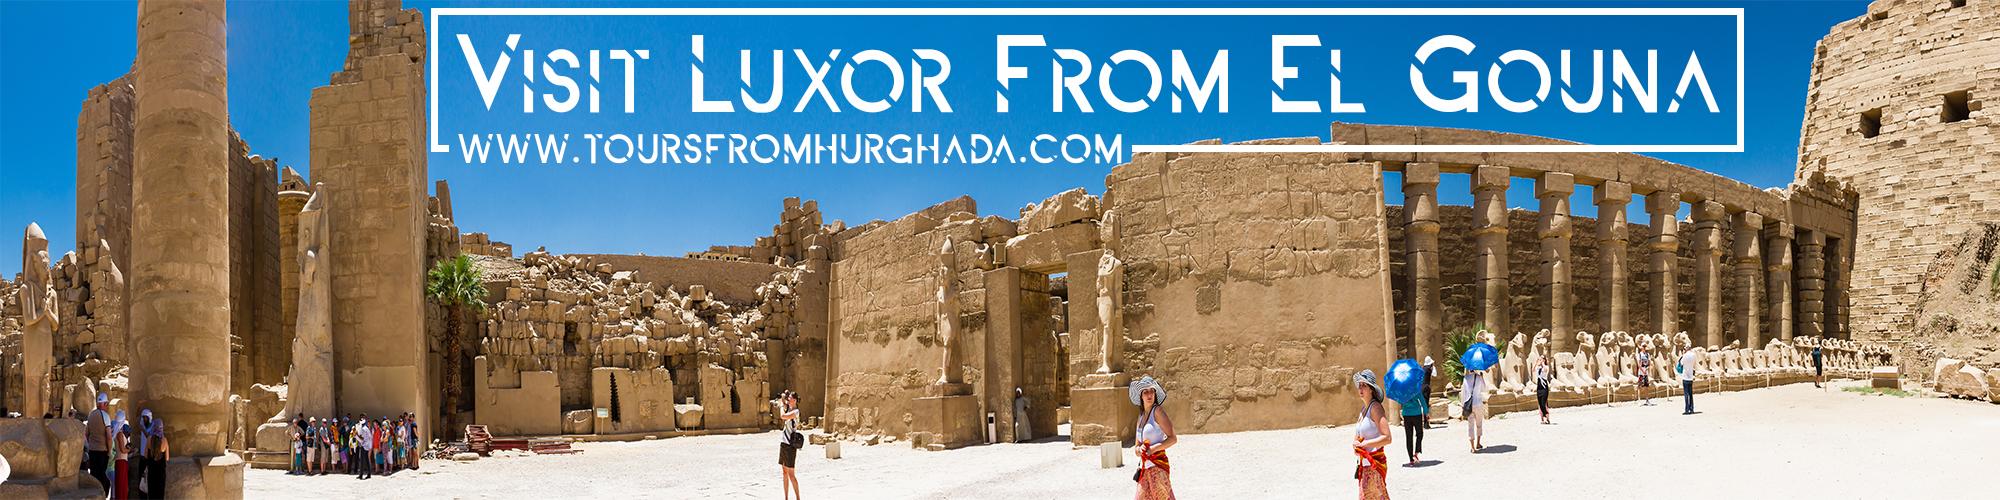 Trips to Luxor from El Gouna ToursFromHurghada